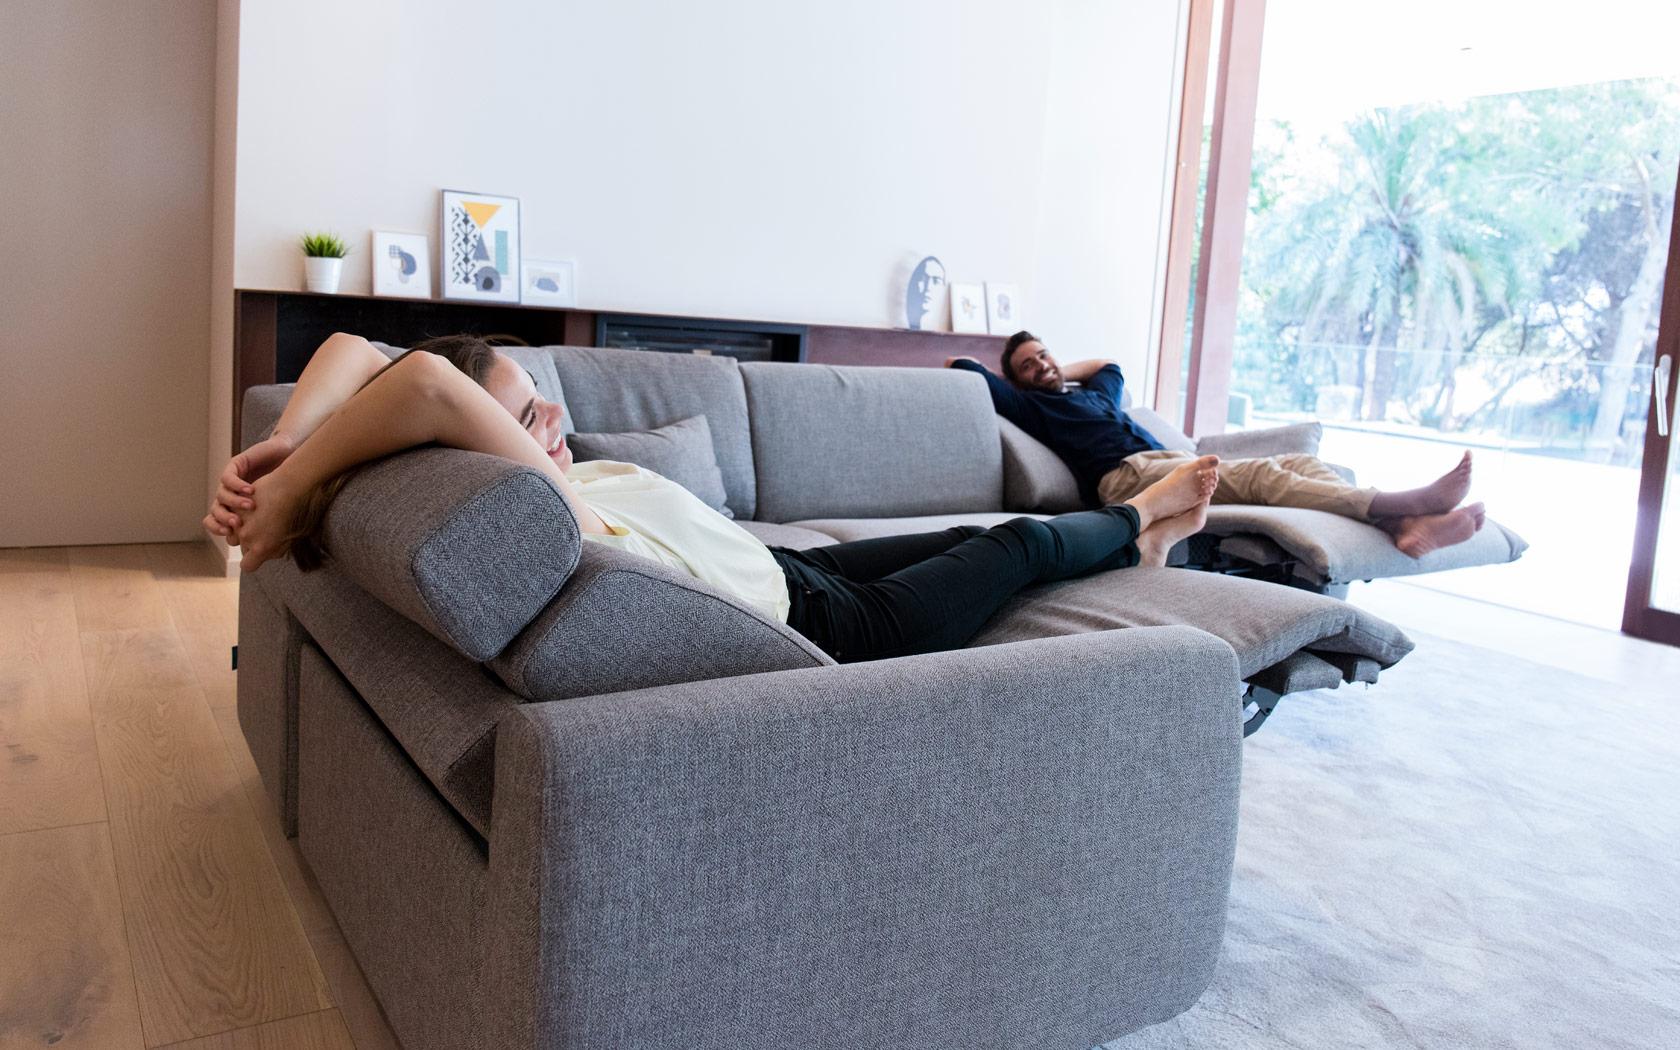 Atlanta sofa relax 2020 06